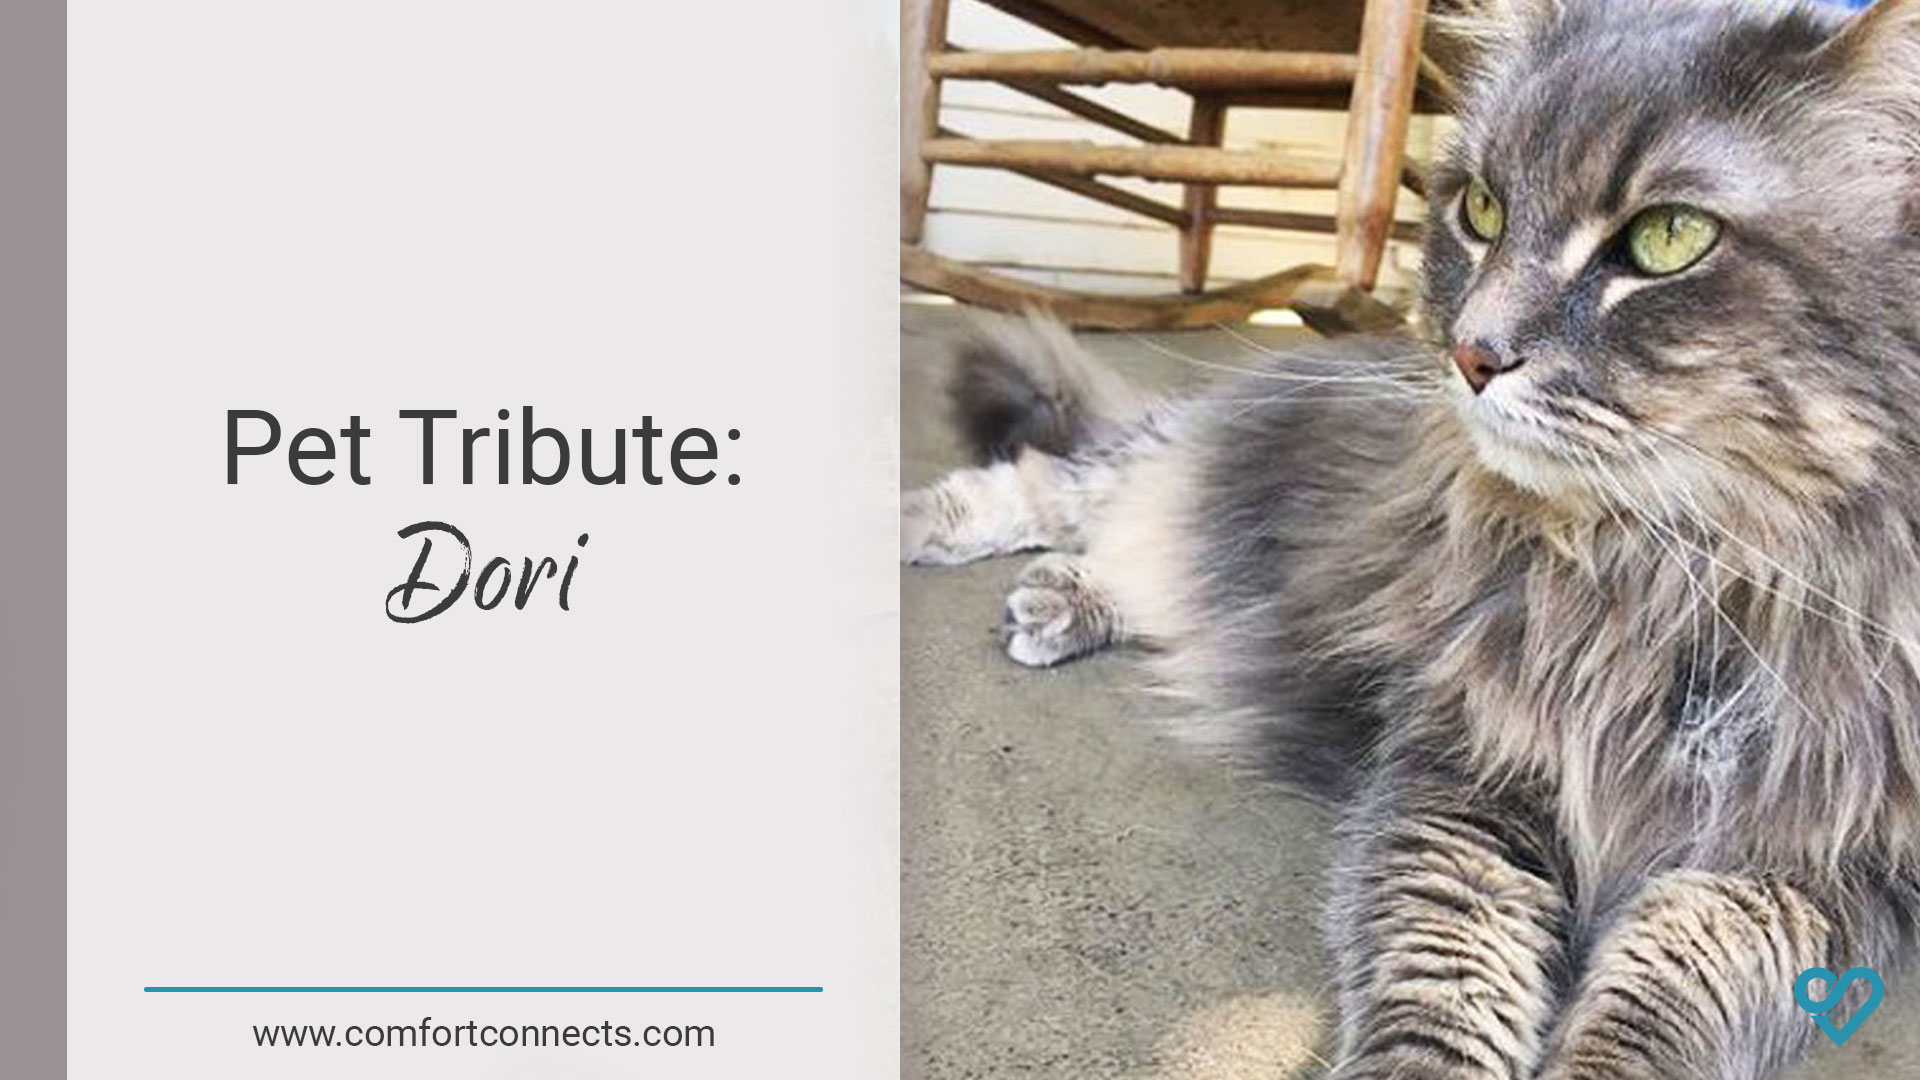 Pet Tribute: Dori